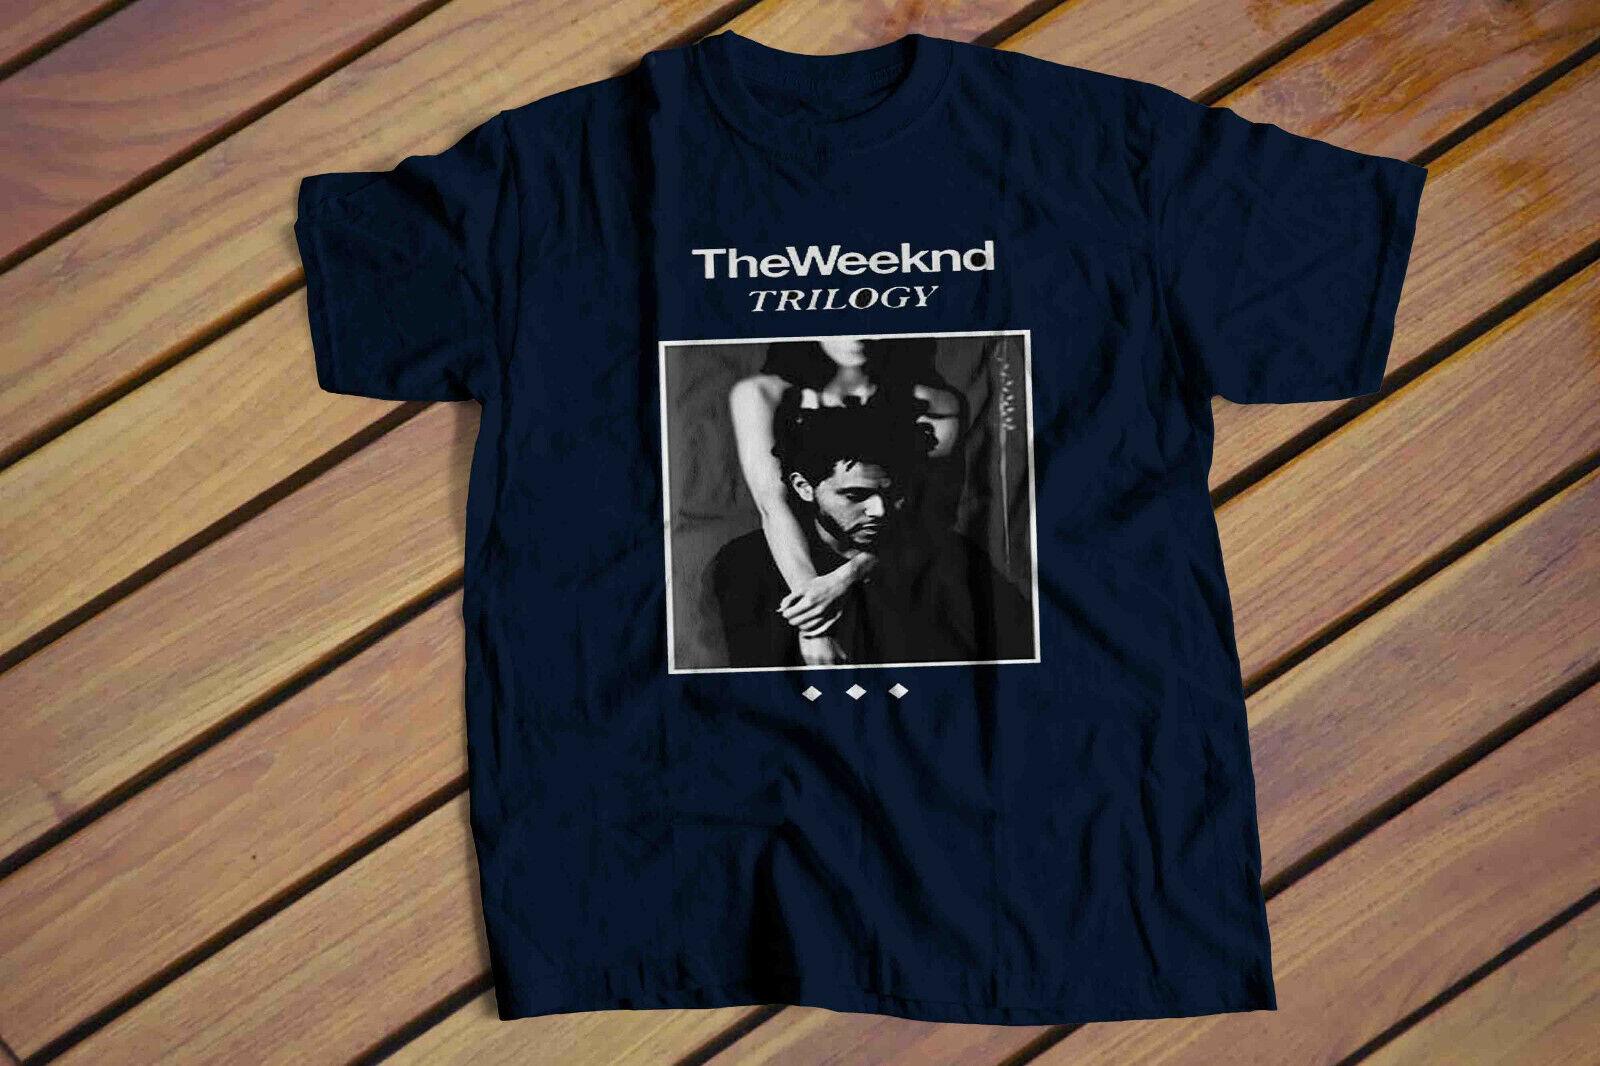 New The Weeknd Trilogy Music Men/'s White T-Shirt Size S M L XL 2XL 3XL